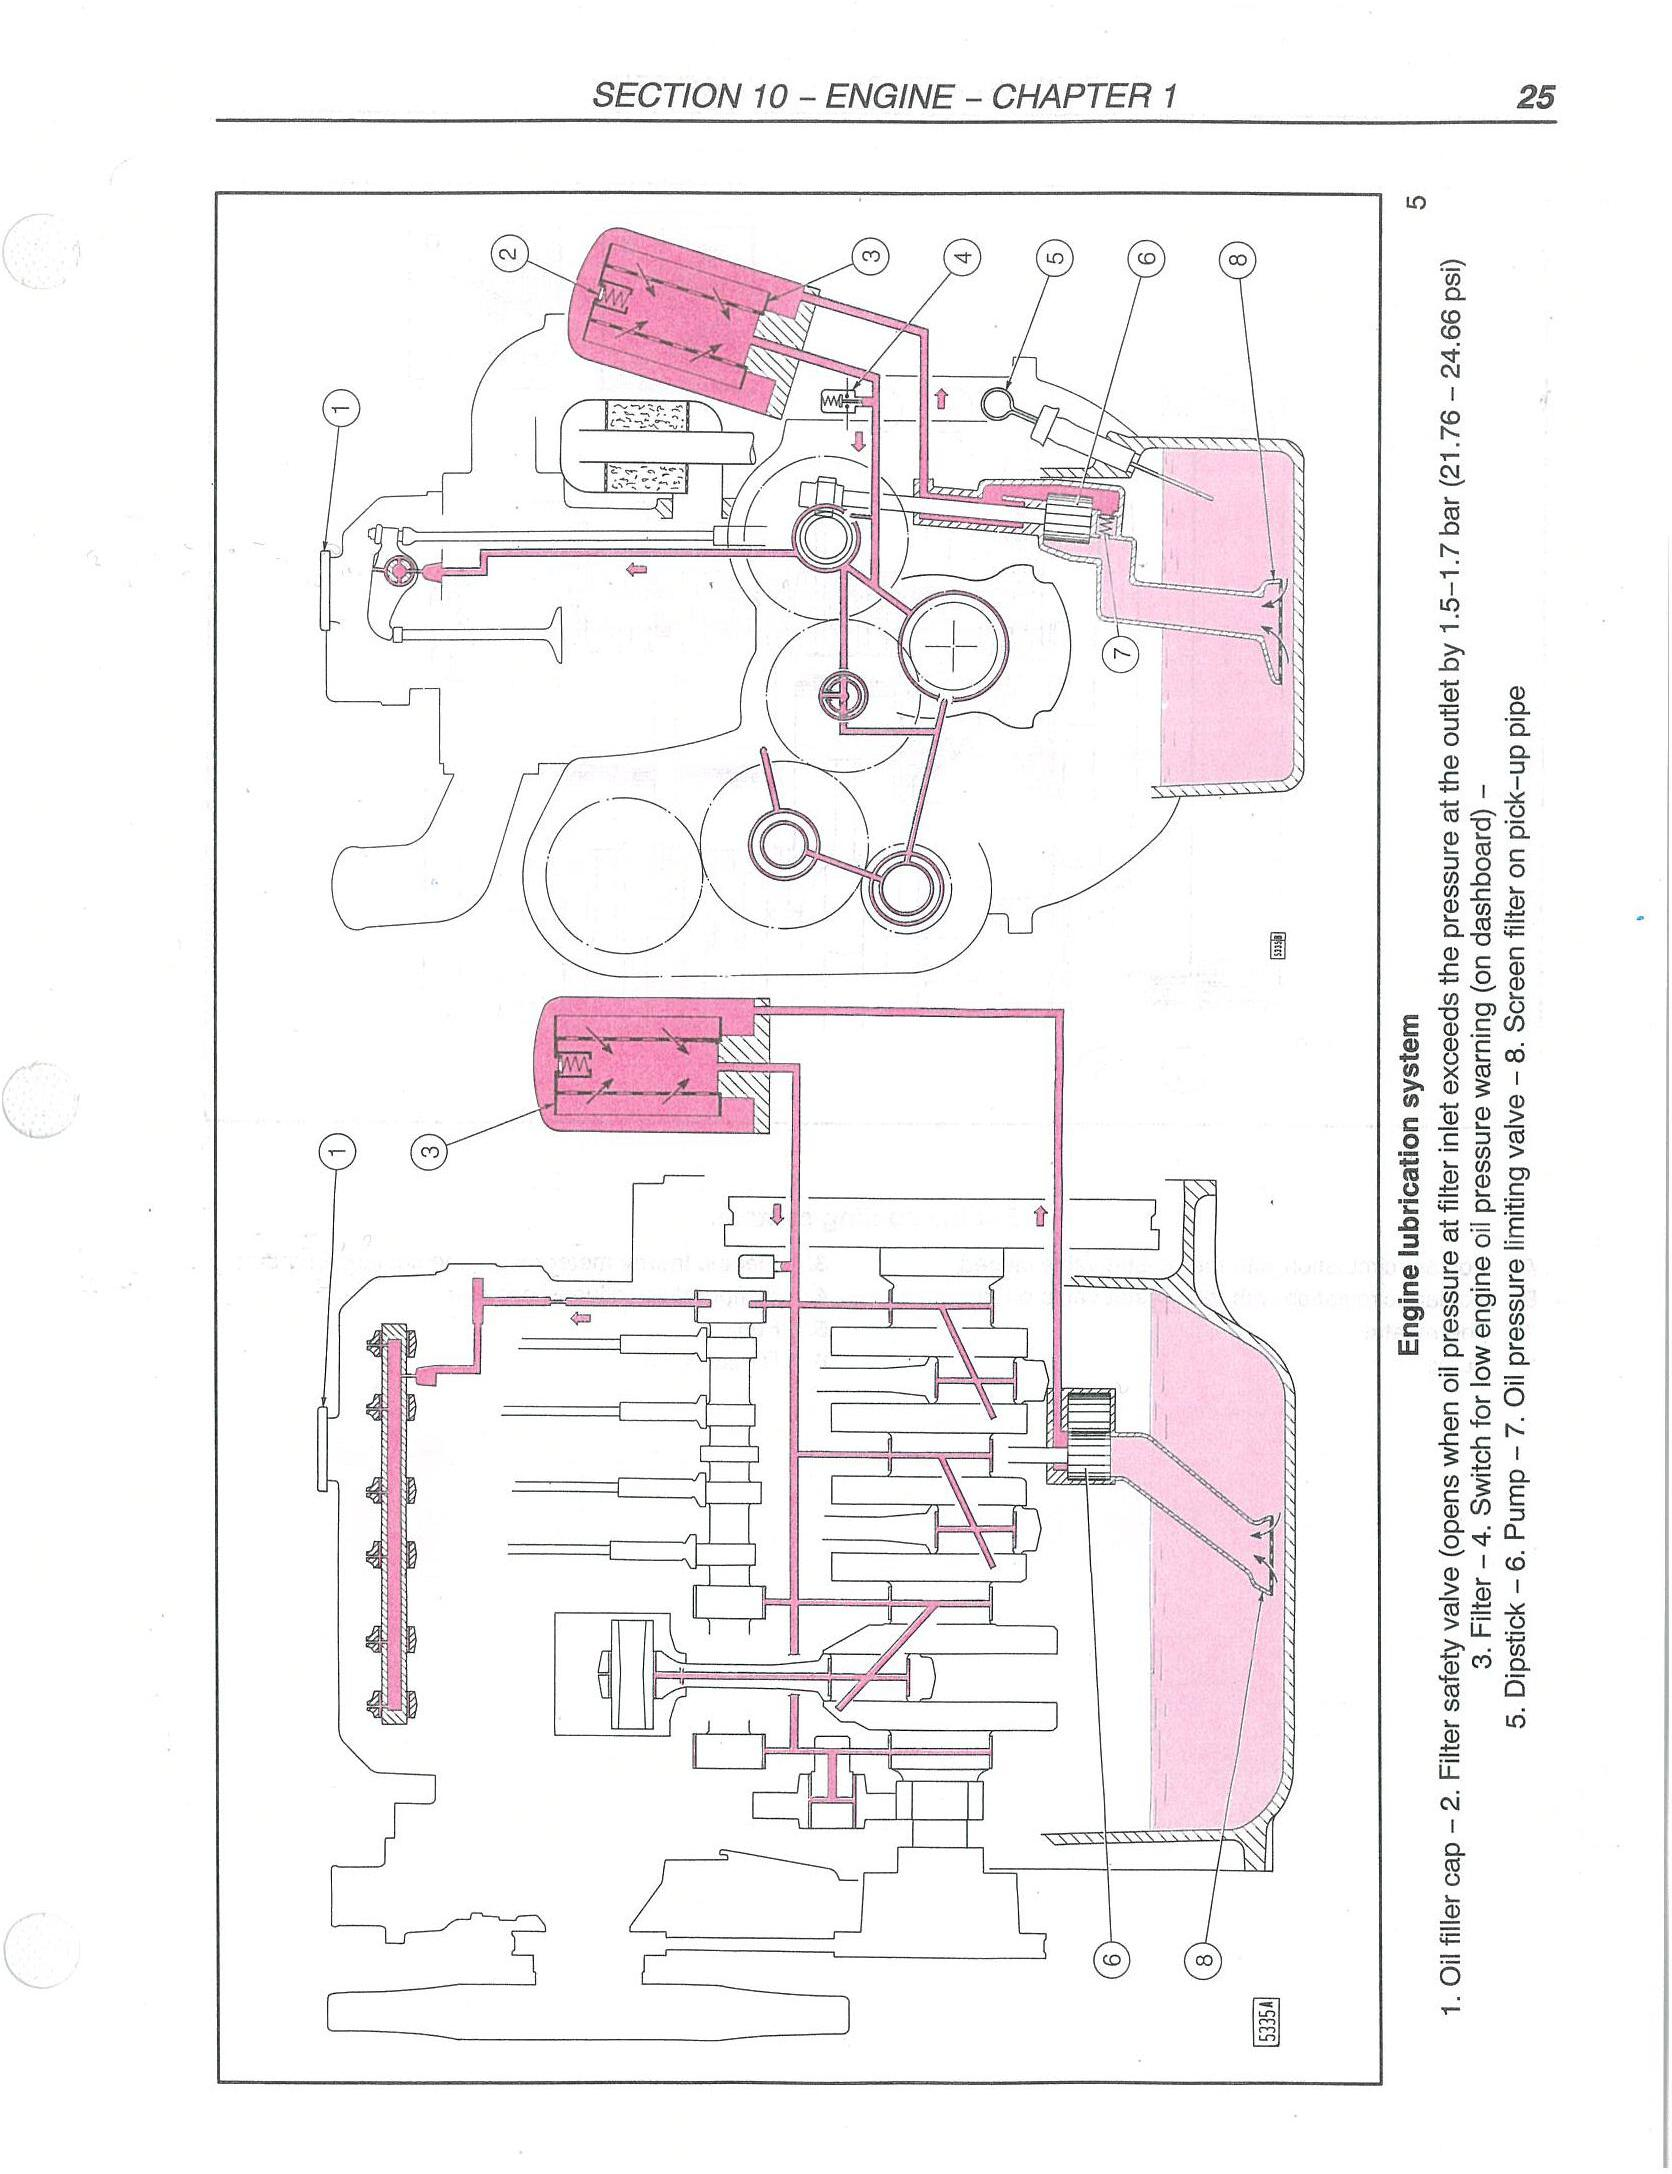 New Holland TN55V, TN65V, TN75V, TN65N, TN75N Tractor Complete Service Manual - 2